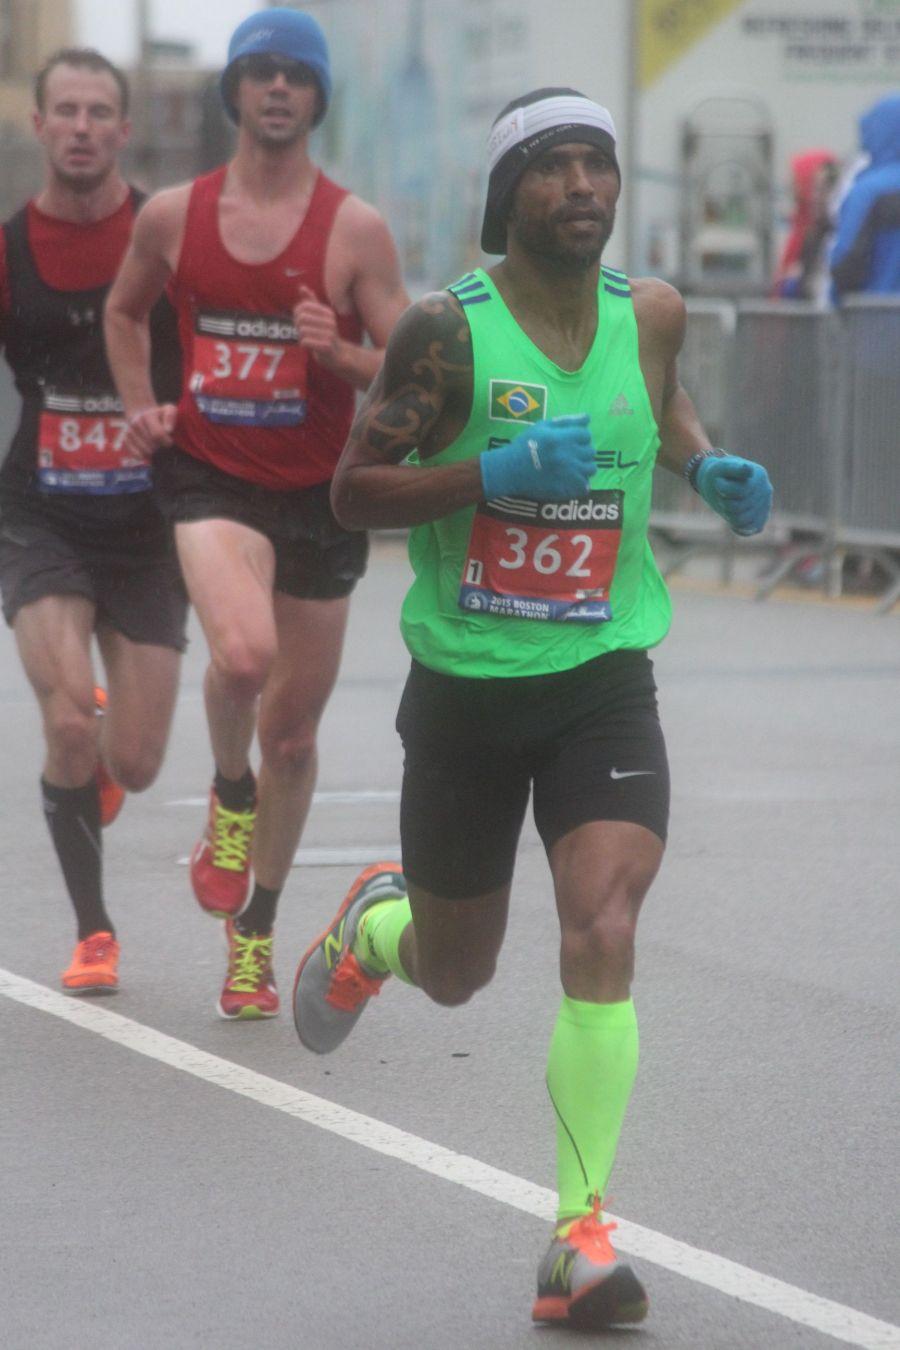 boston marathon april 20 2015 racer number 362